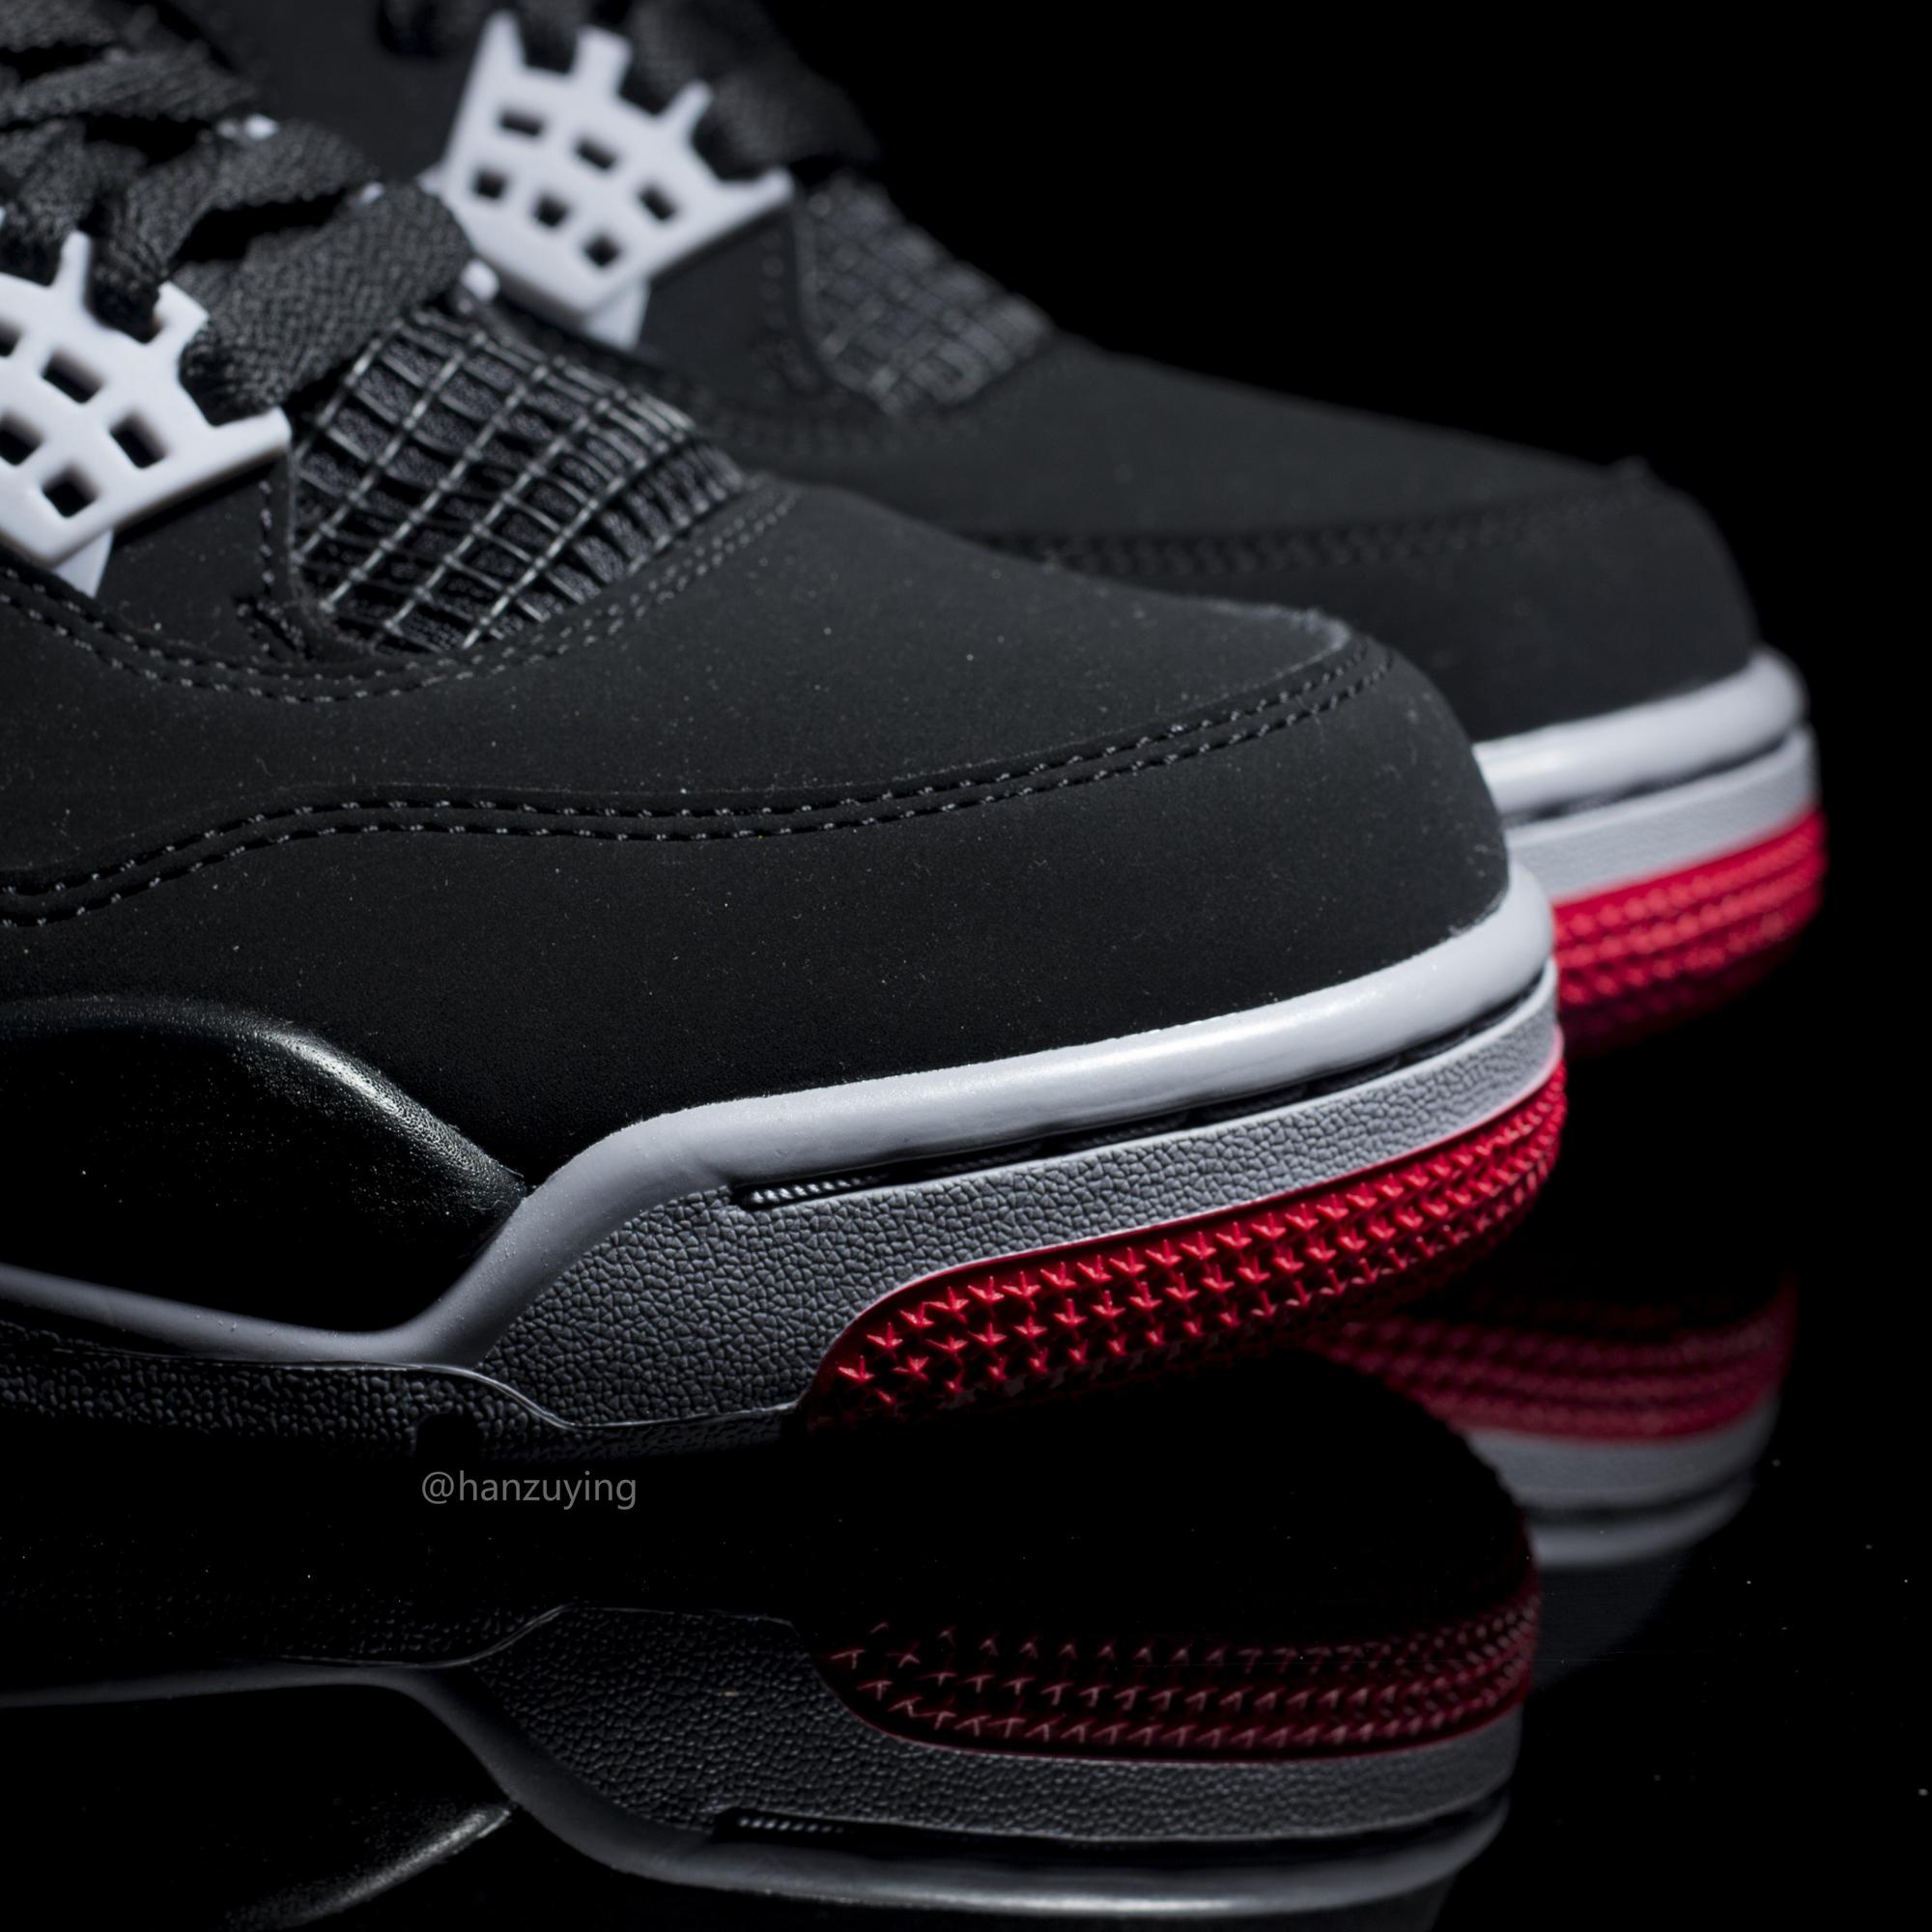 b16dd939444f25 Air-Jordan-4-Black-Cement-OG-2019-7 - WearTesters